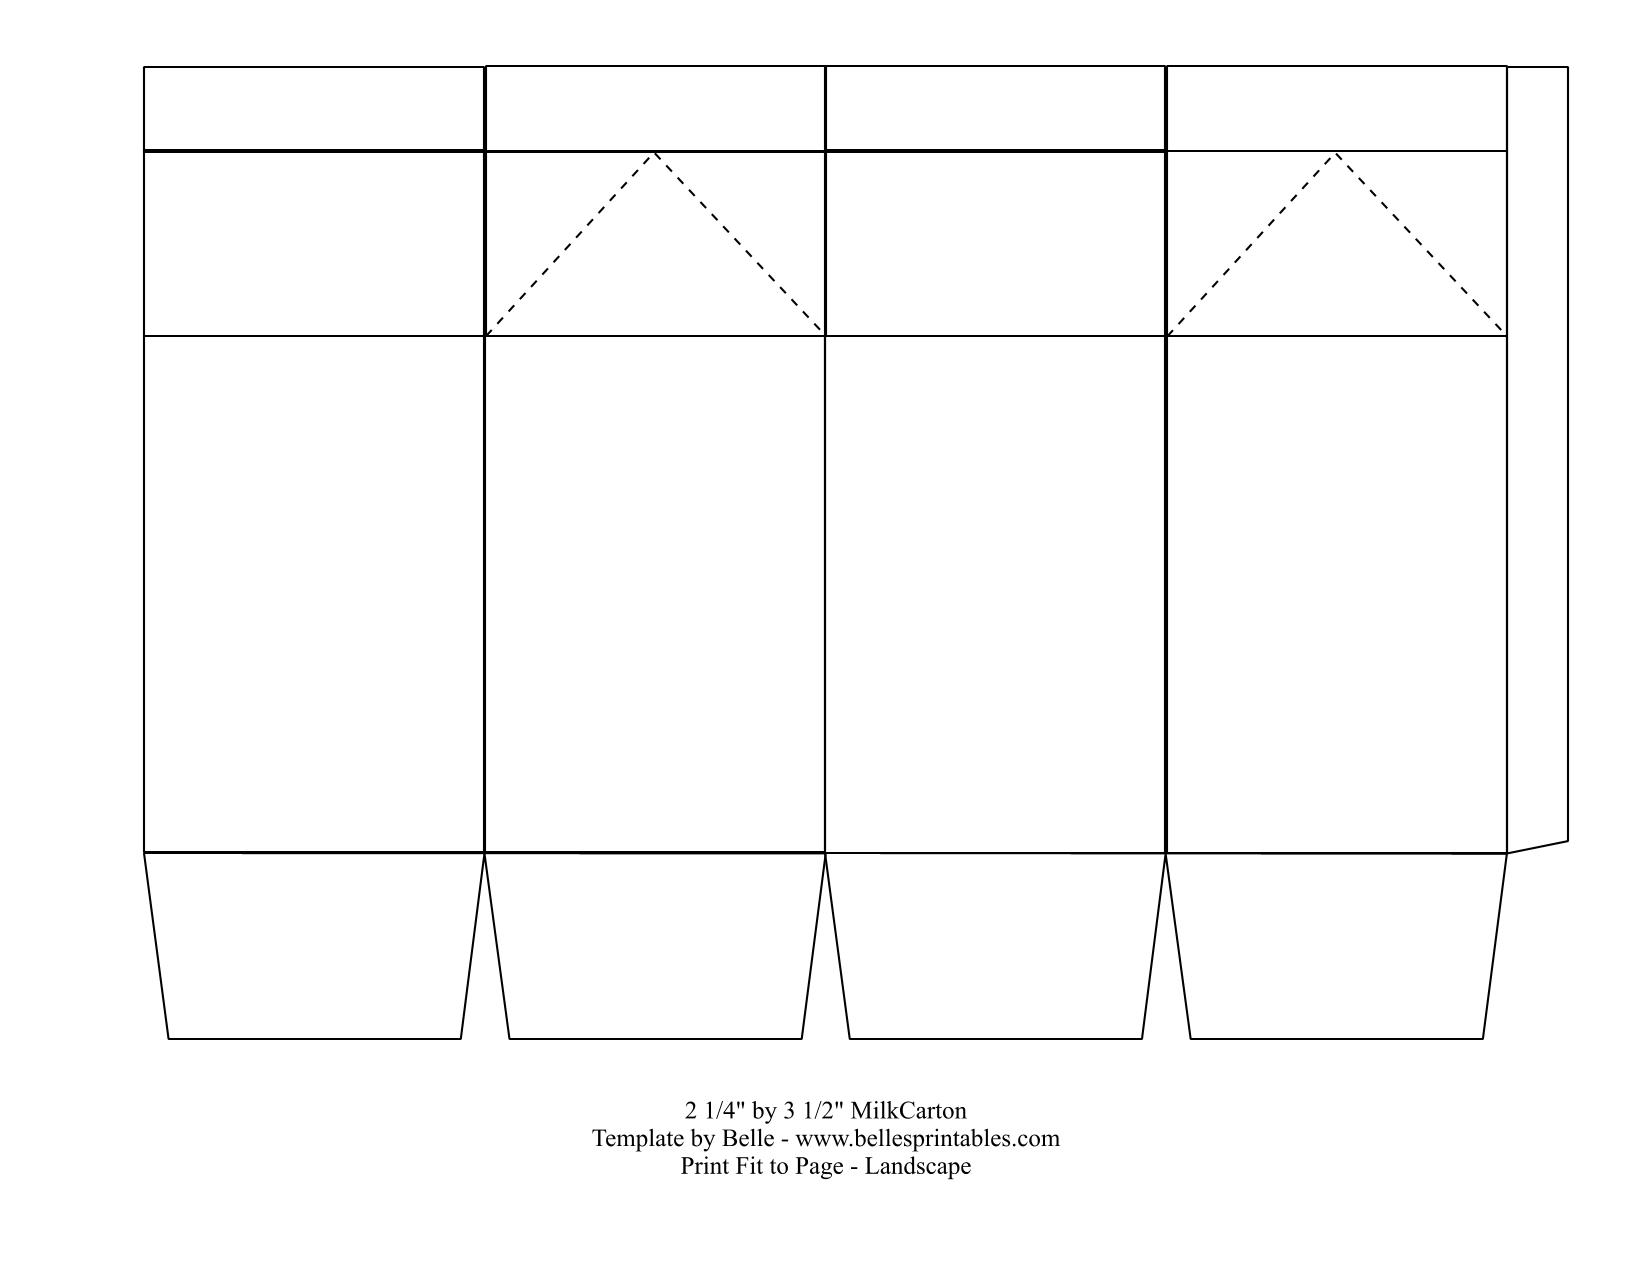 EASY MILK CARTON BOX TEMPLATE: You like the milk carton box idea